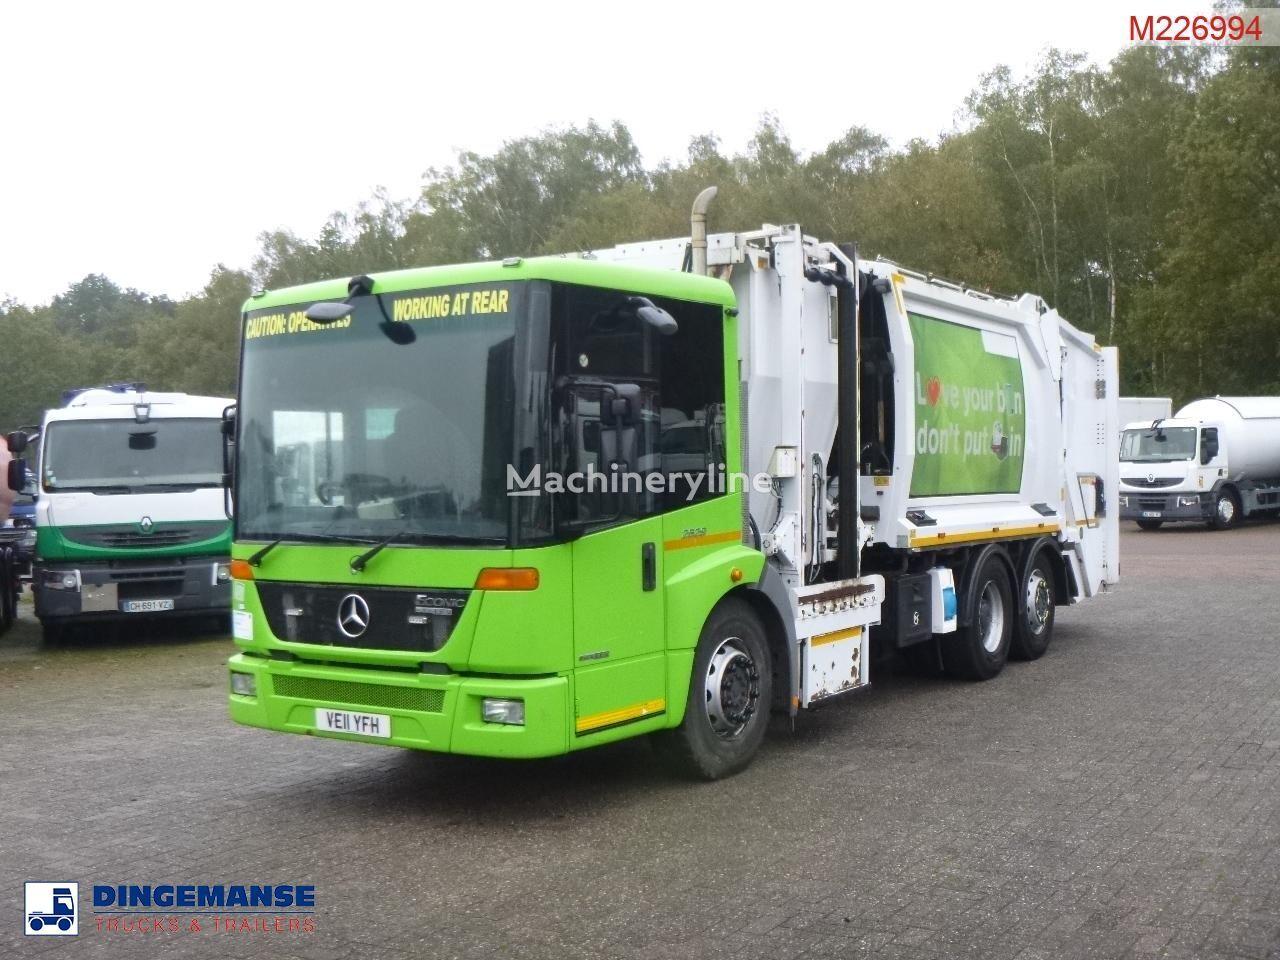 боклукчийски камион MERCEDES-BENZ Econic 2629 RHD 6x2 Geesink Norba refuse truck